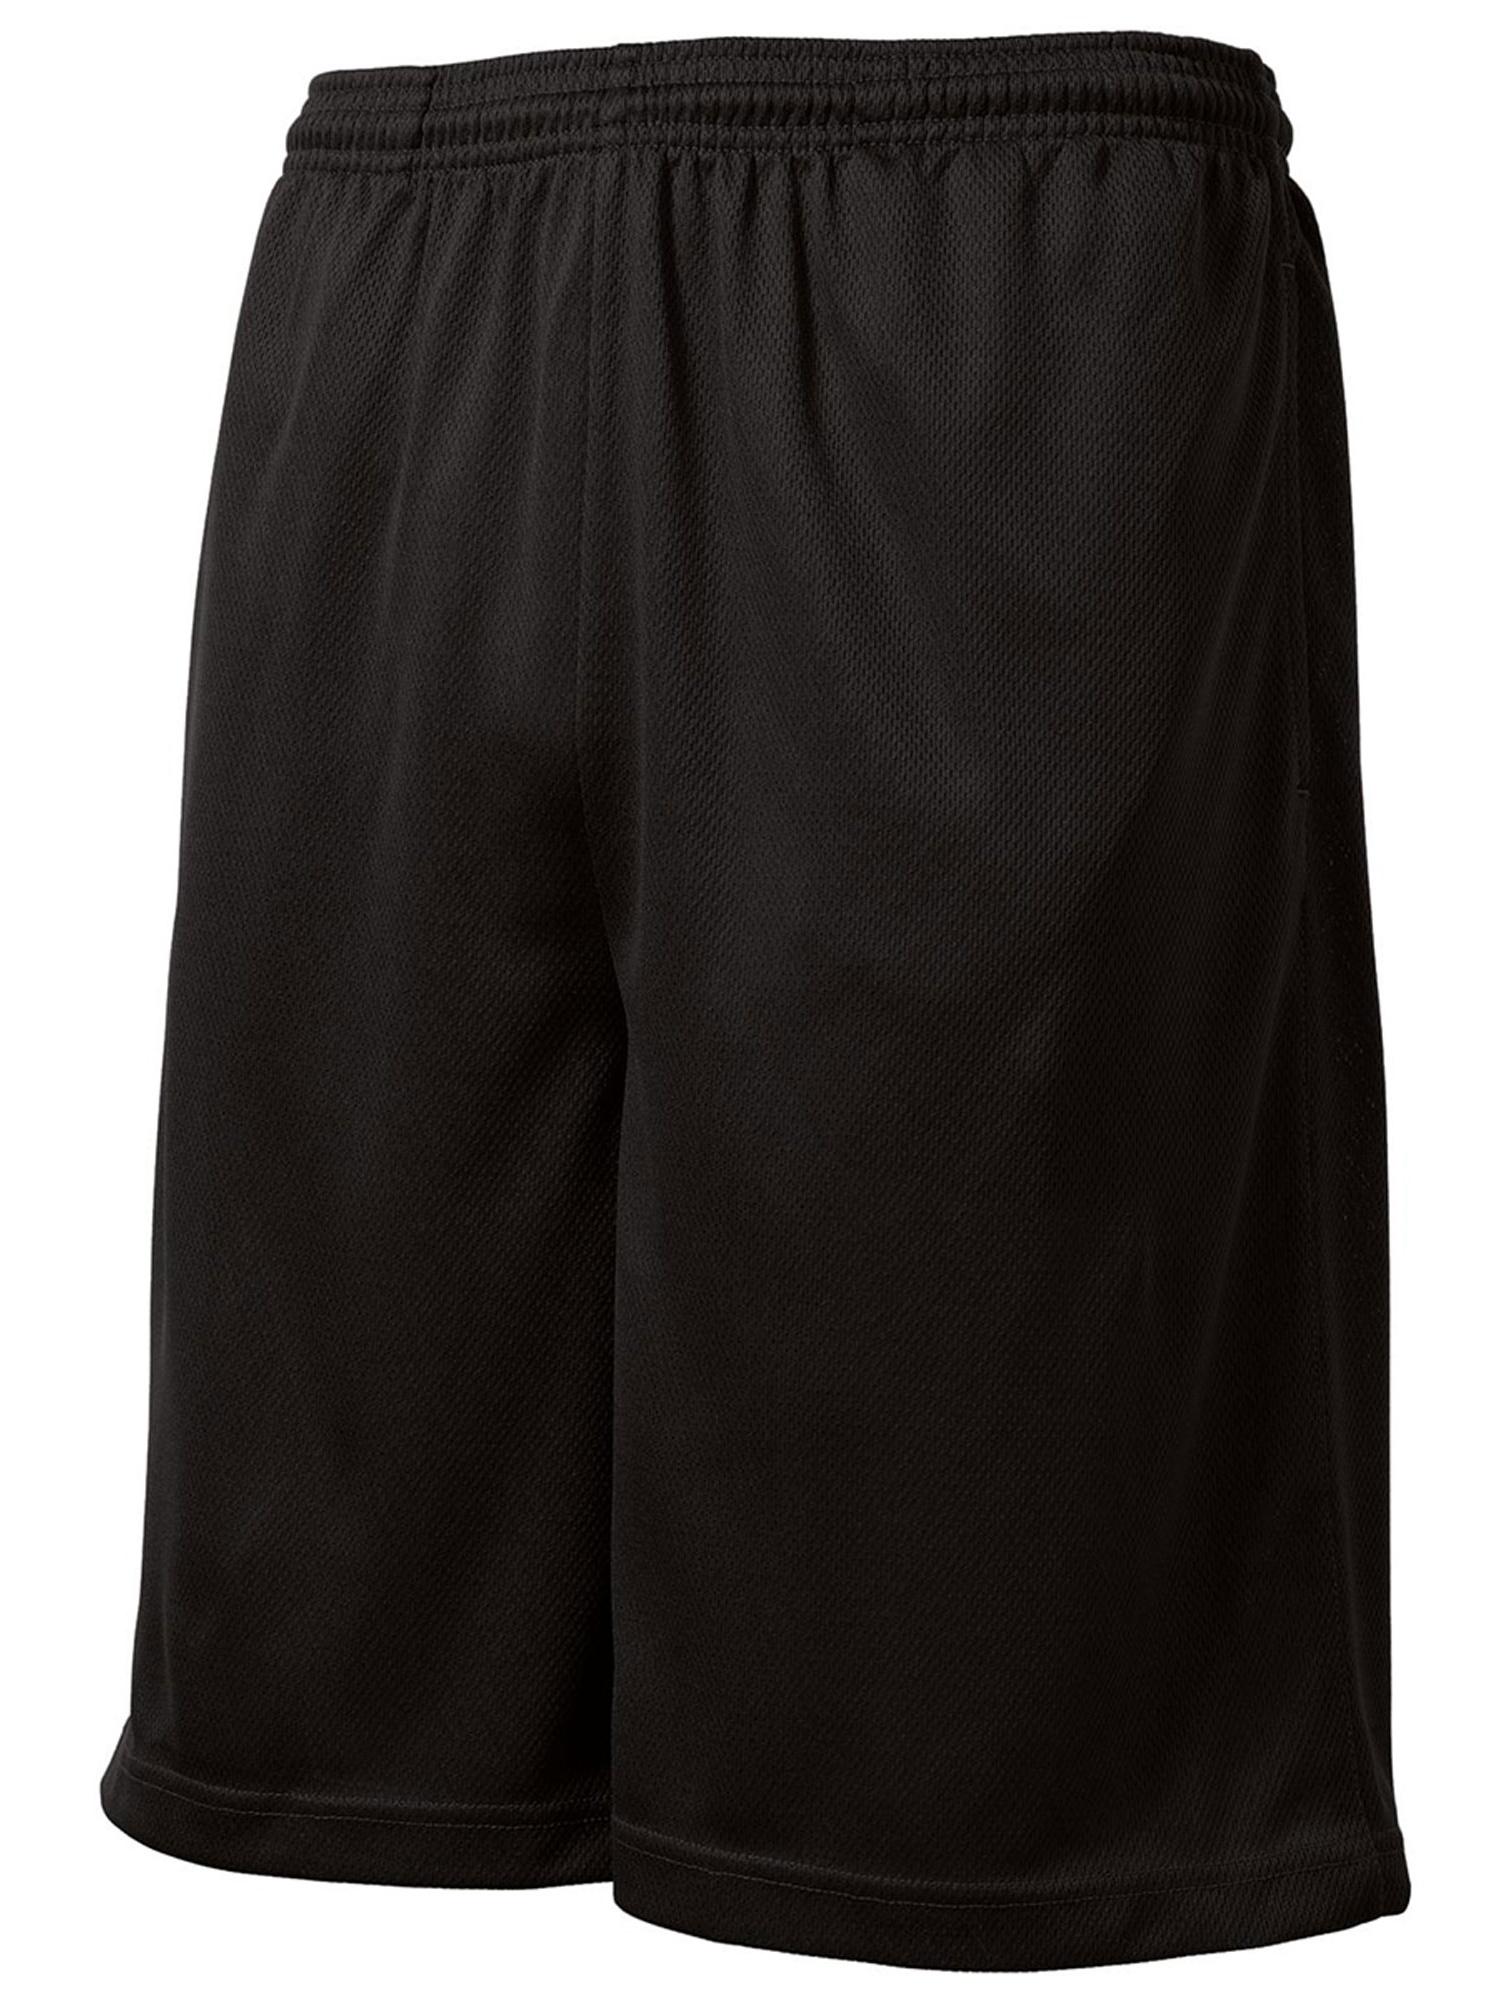 Sport-Tek Men's Comfort Side Pocket Performance Short